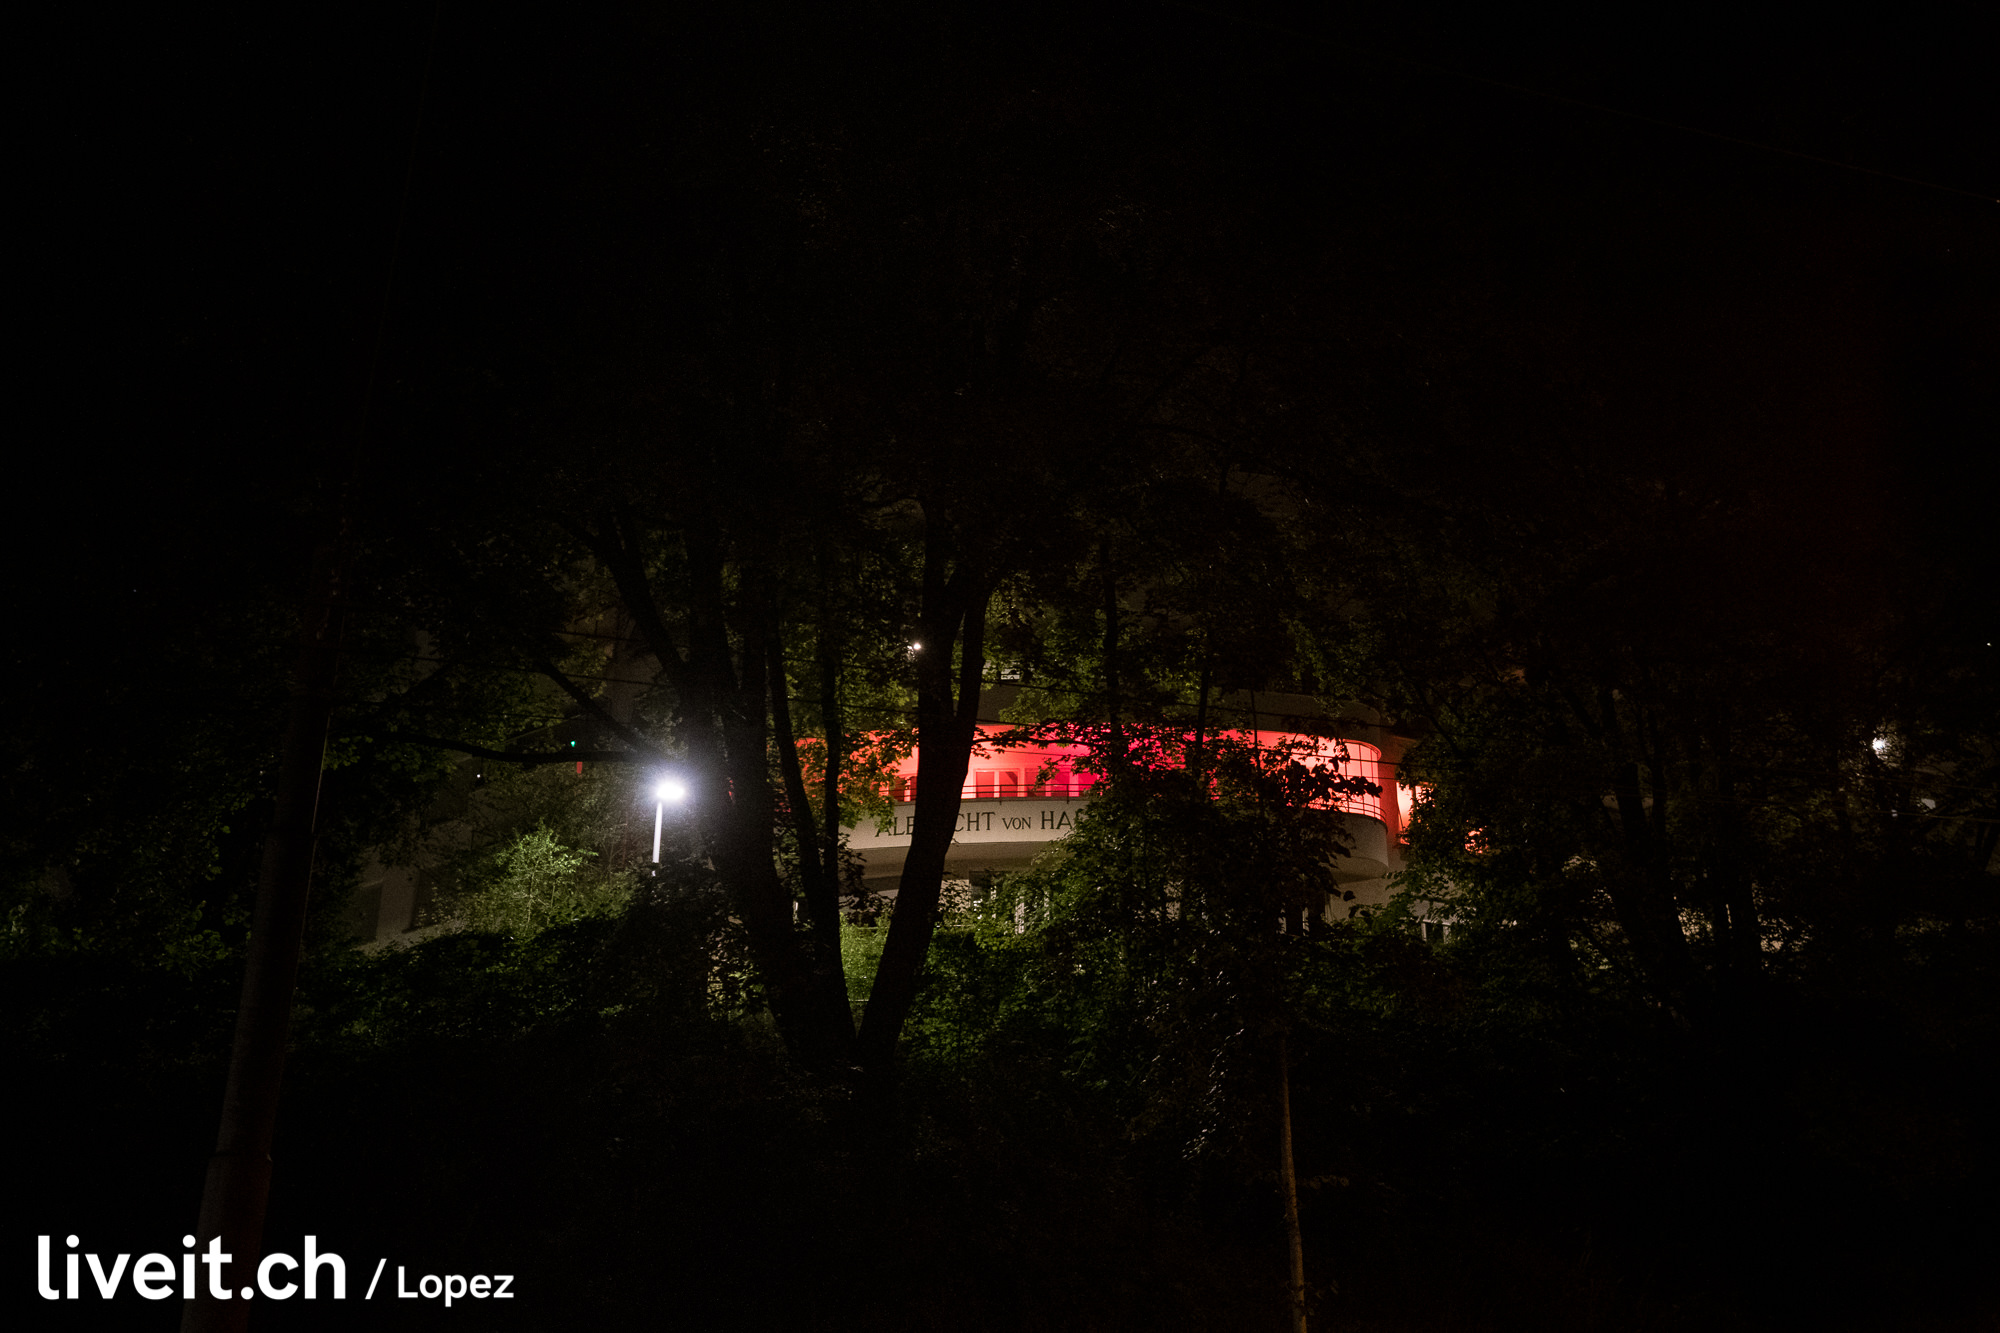 SCHWEIZ NIGHT OF LIGHT